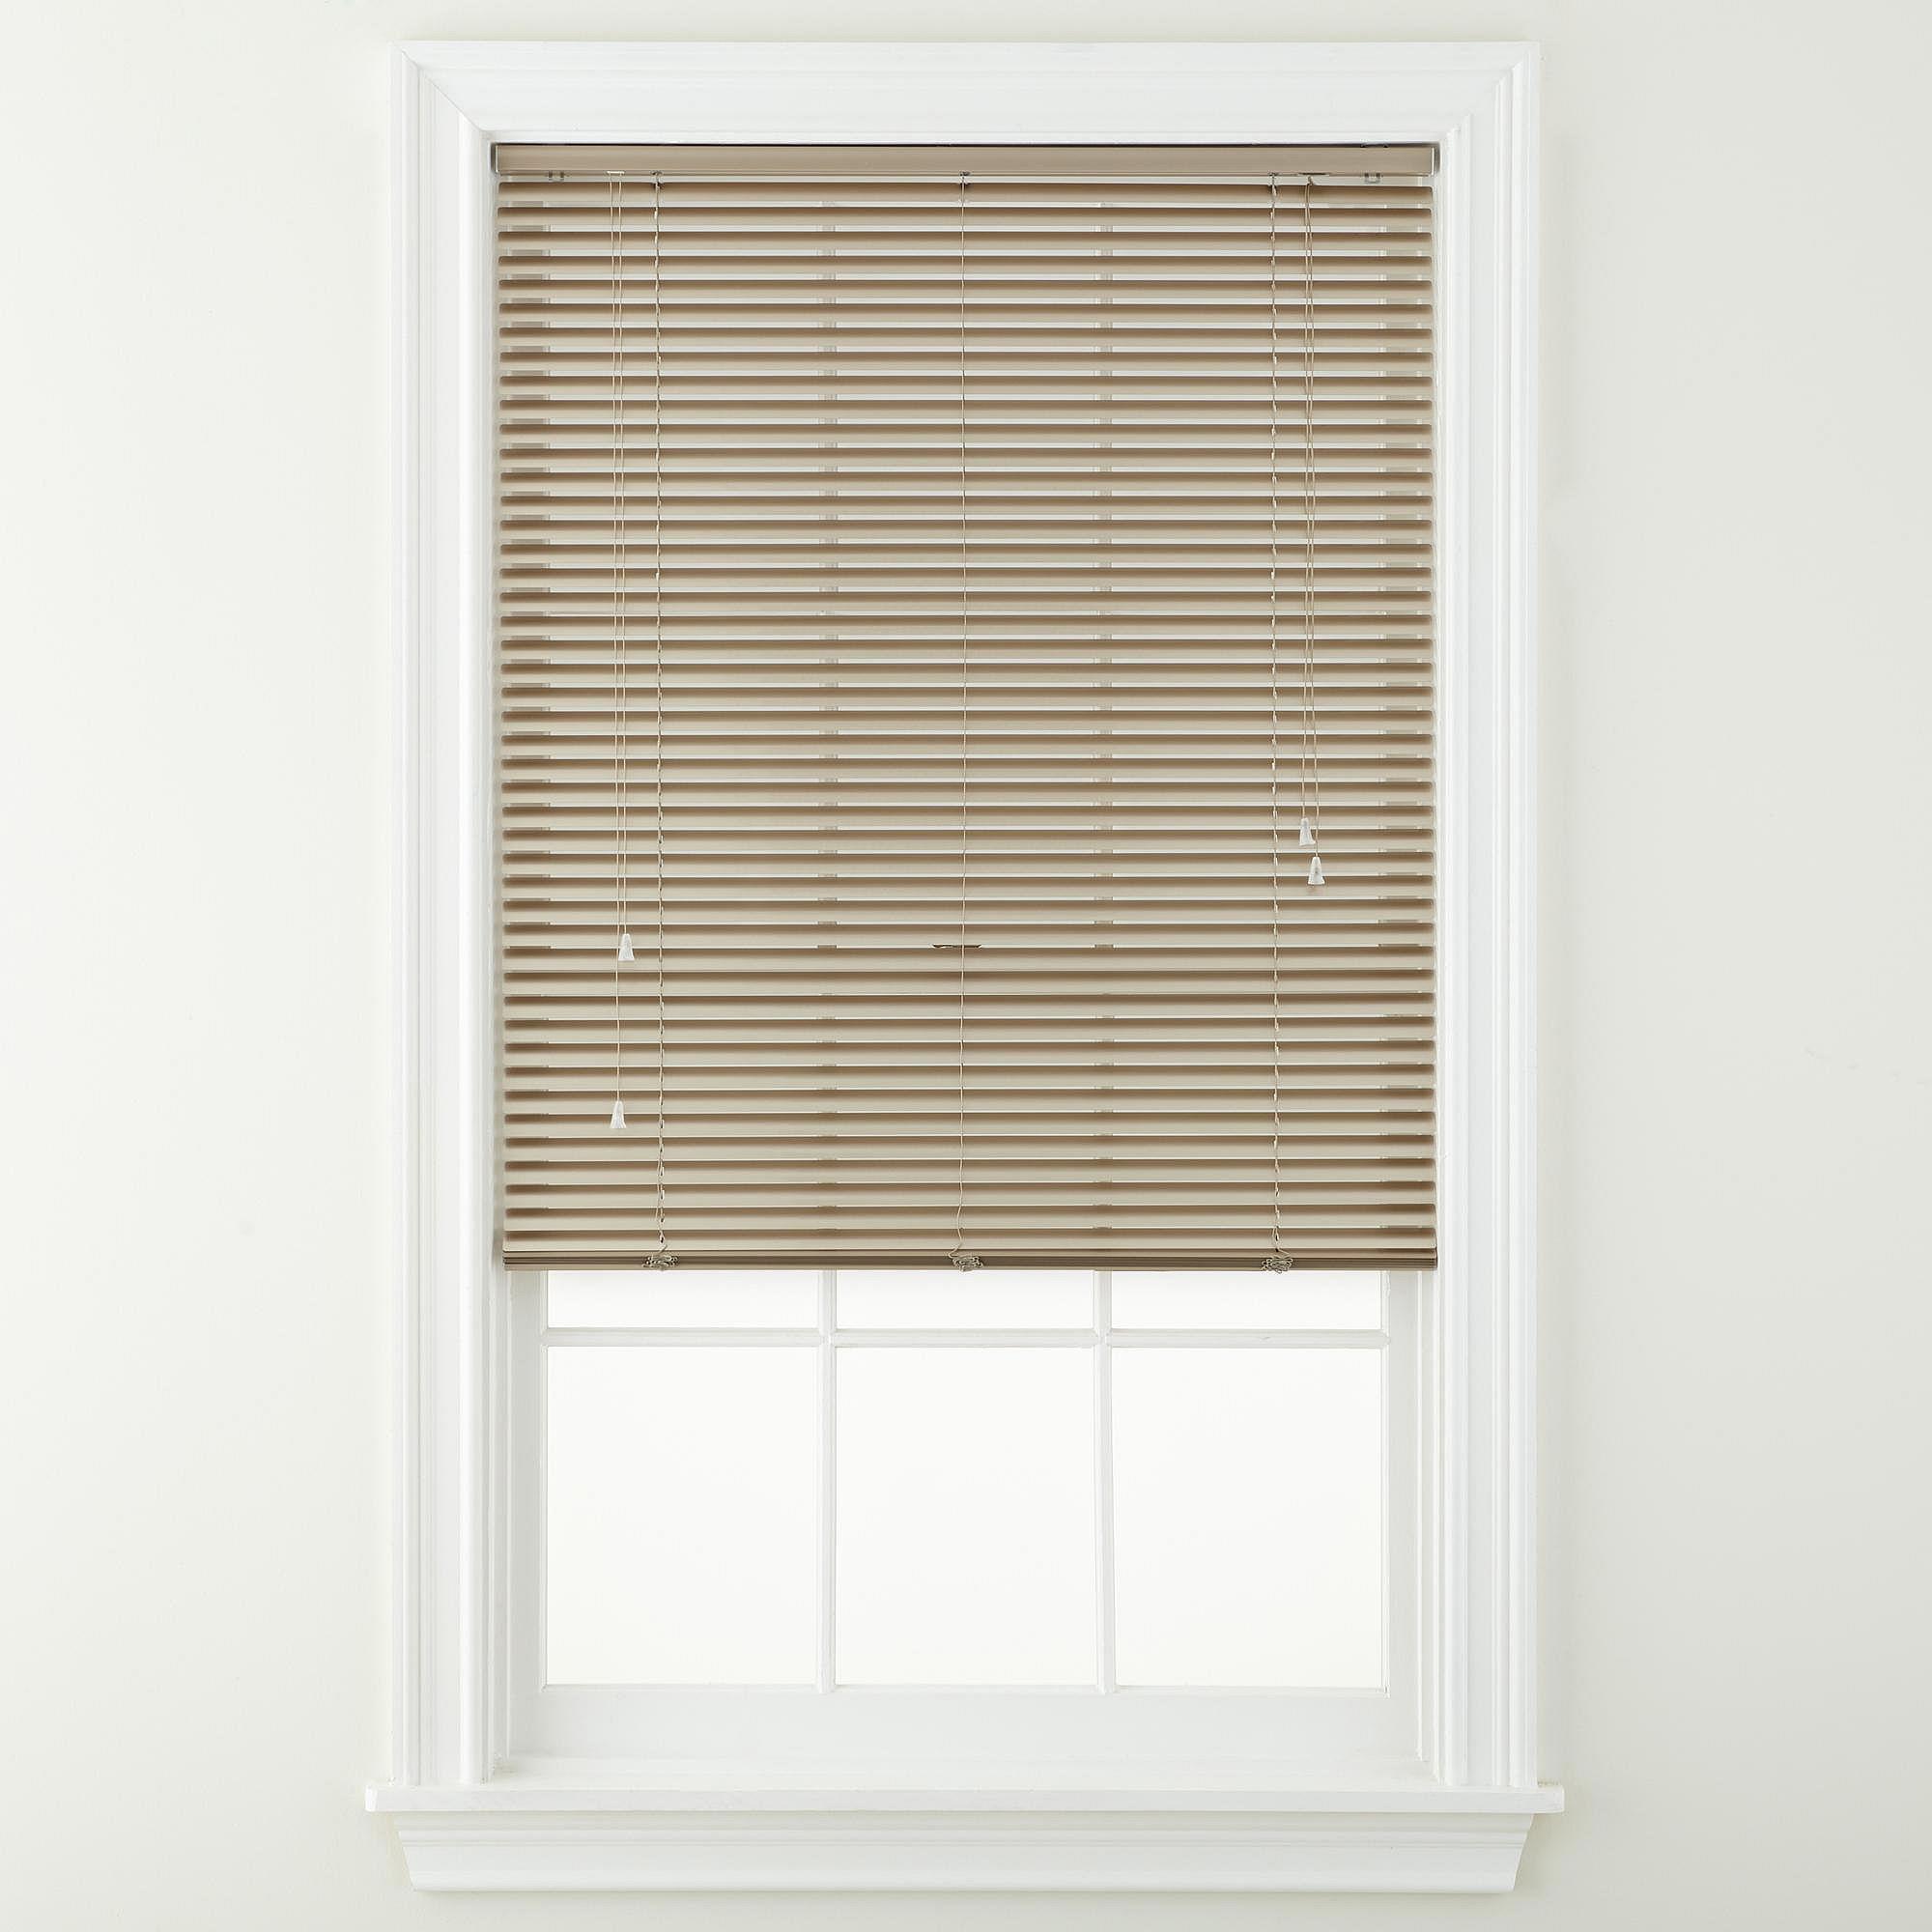 Http Www Dressesclassic Com Search Jcpenney Window Blinds